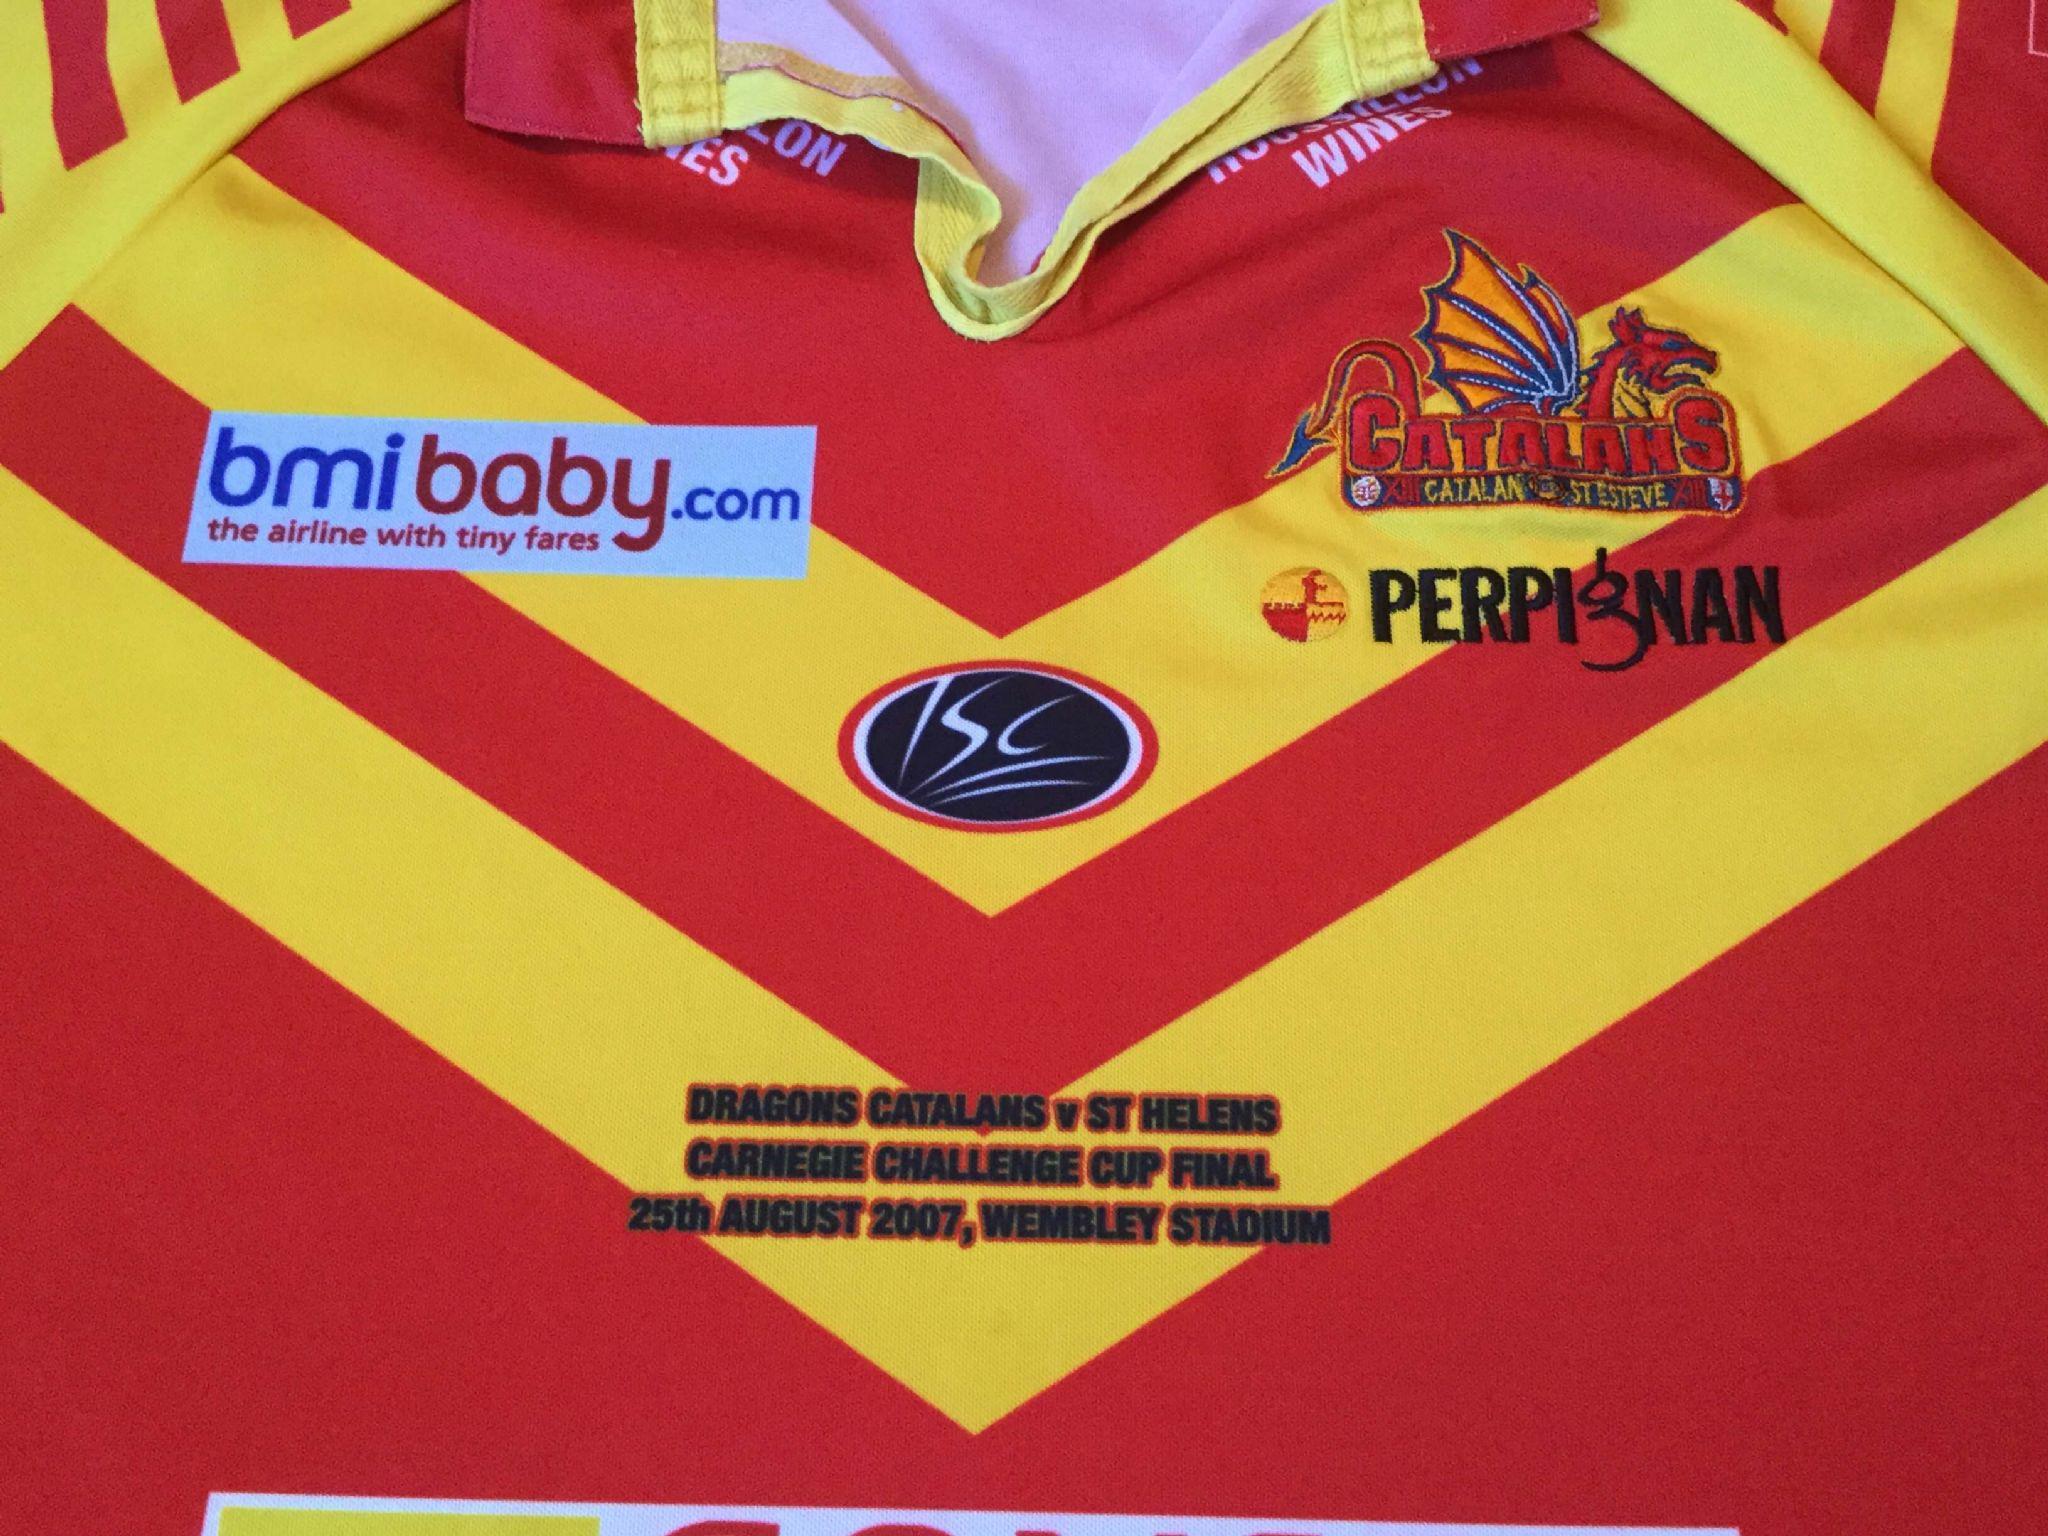 ba766b0e1 Classic Rugby Shirts